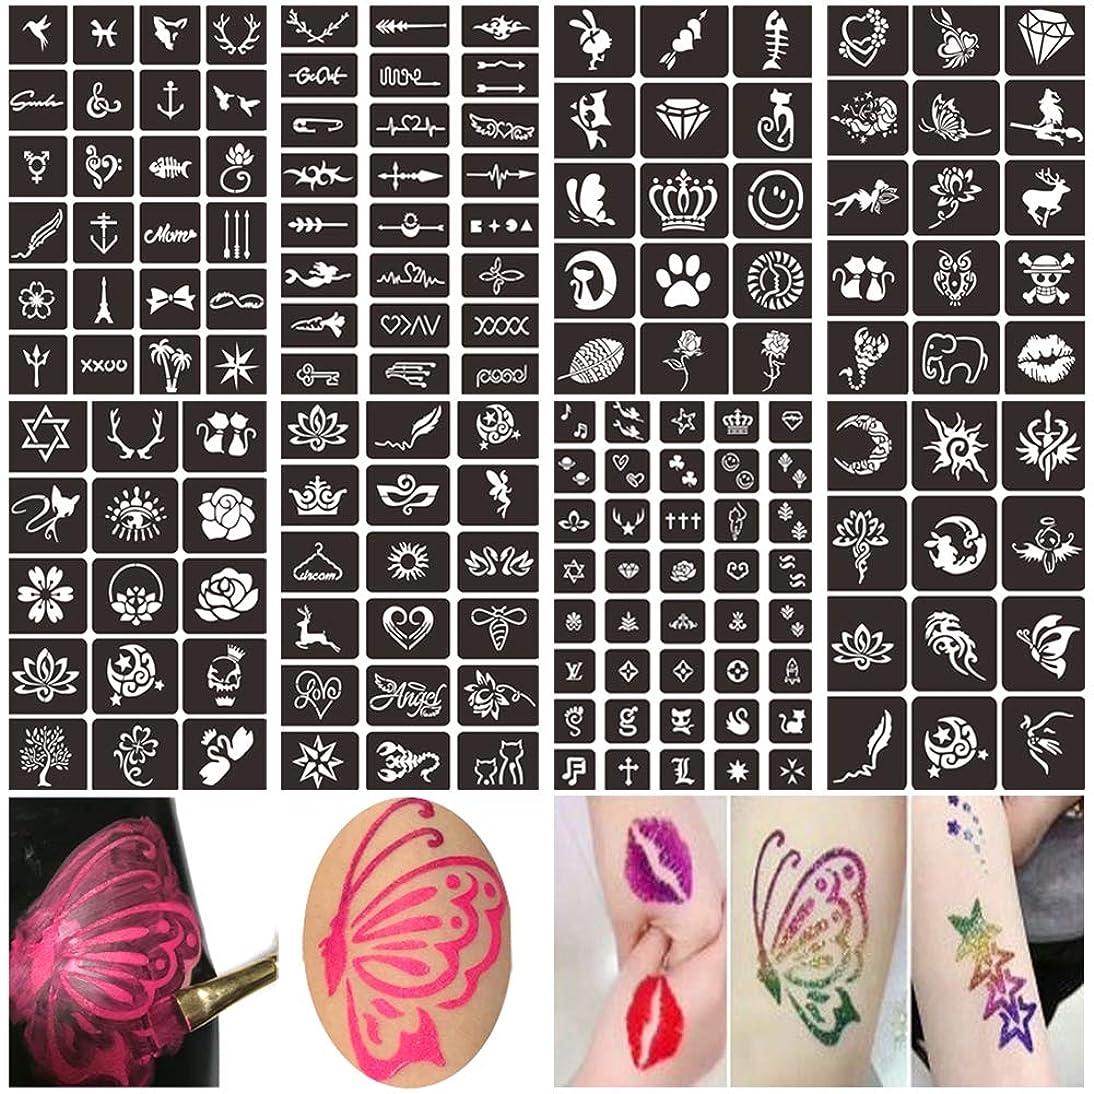 Henna Glitter Tattoo Stencils Kit, Face Body Painting Stencils, Temporary Tattoos Stencils for Kids, Adult & Teenagers (8 Sheets)